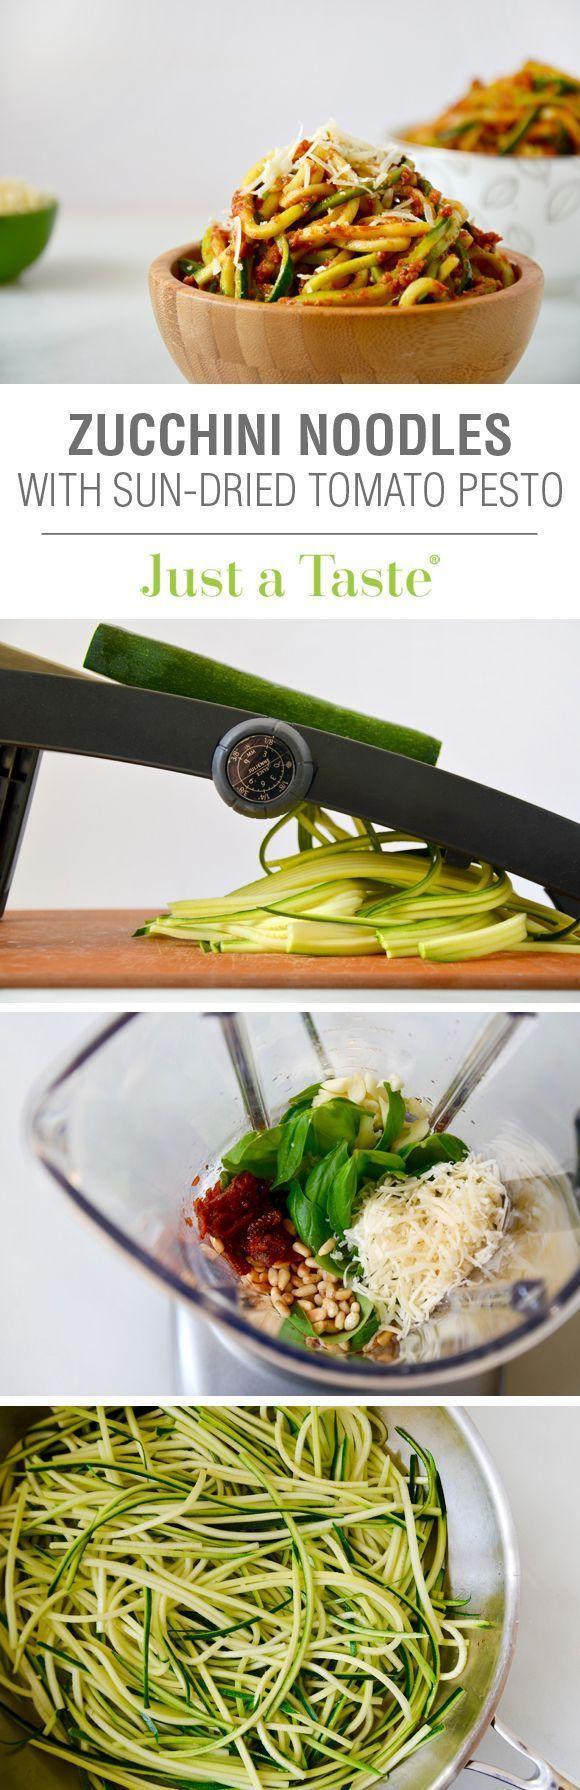 Zucchini Noodles with Sun-Dried Tomato Pesto #recipe from @justataste